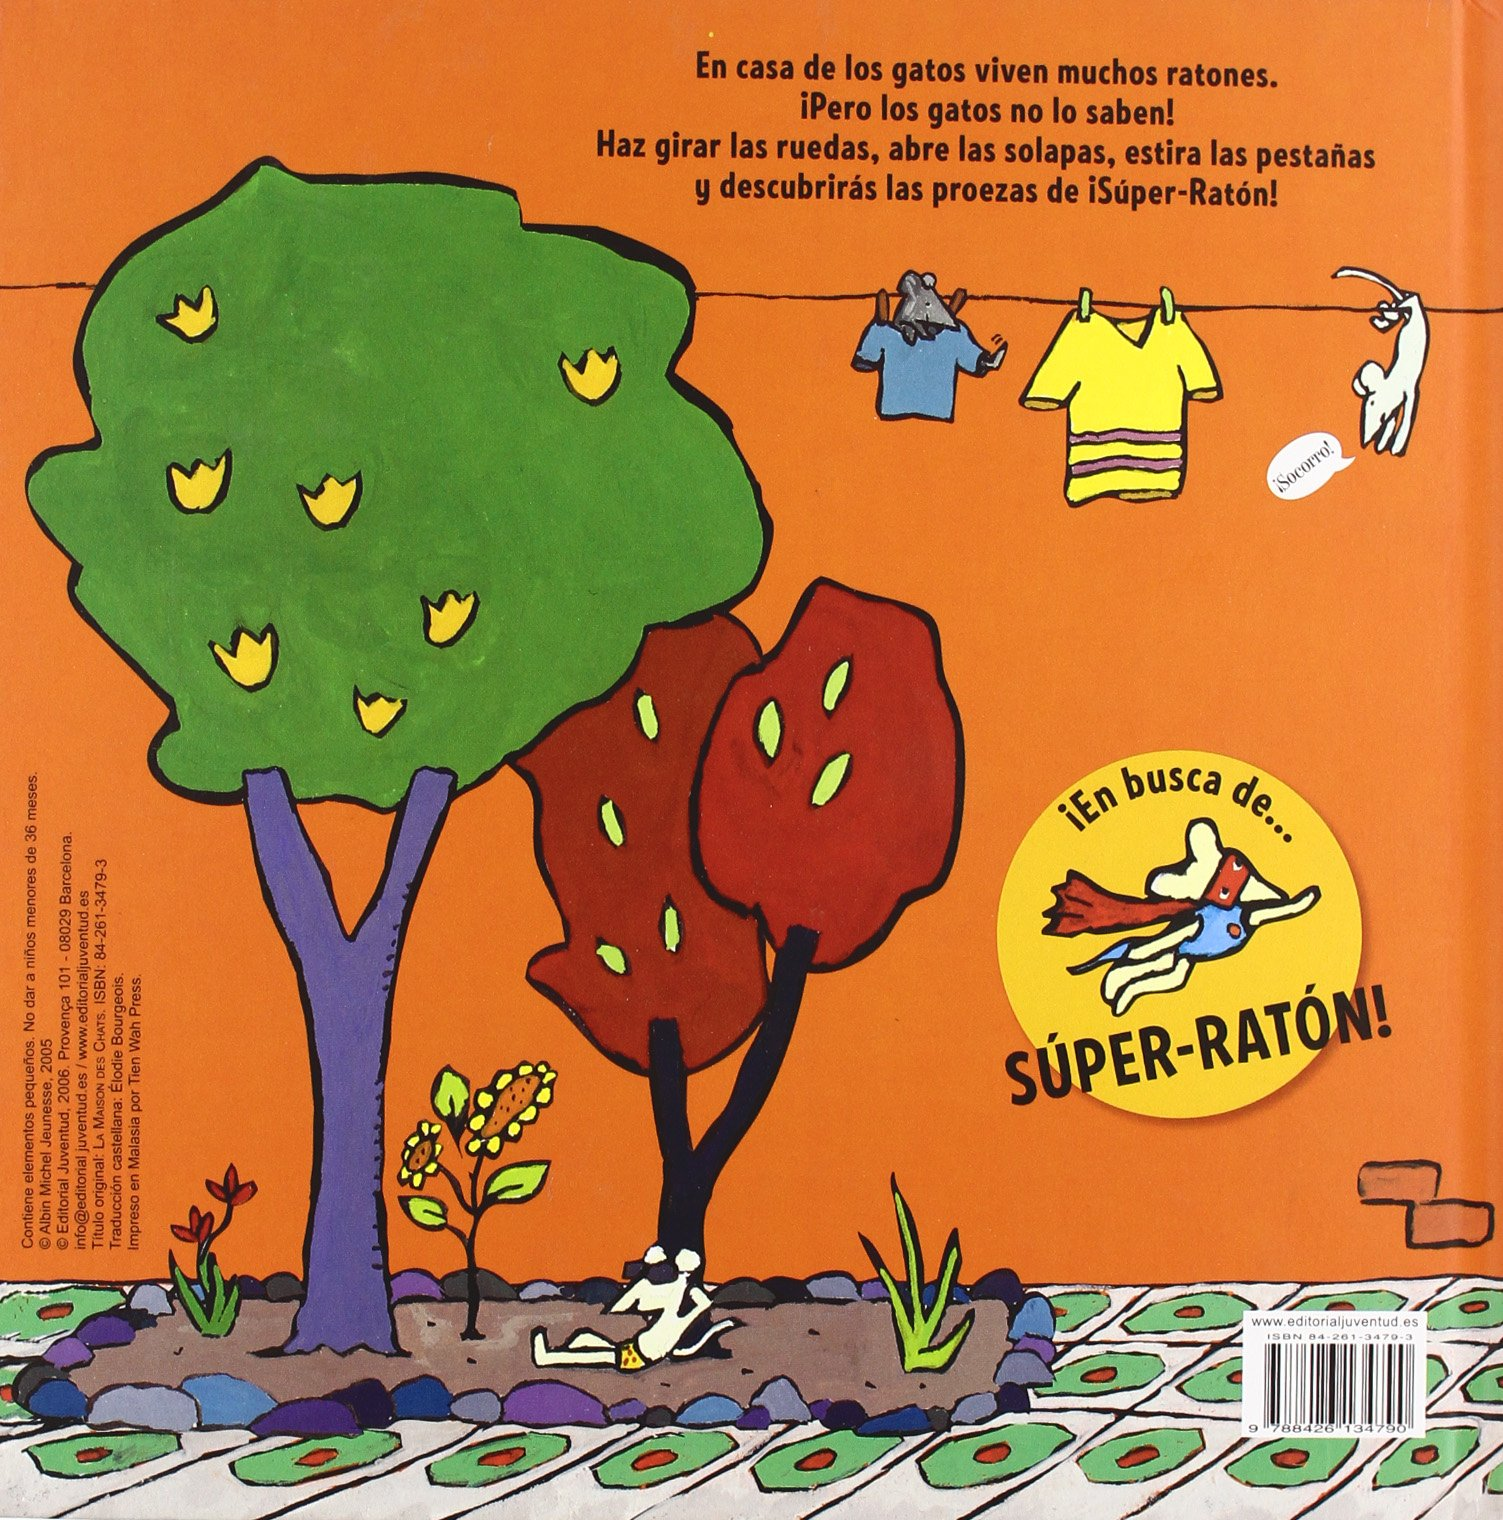 La Casa de Los Gatos (Spanish Edition): Gilles Eduar: 9788426134790: Amazon.com: Books